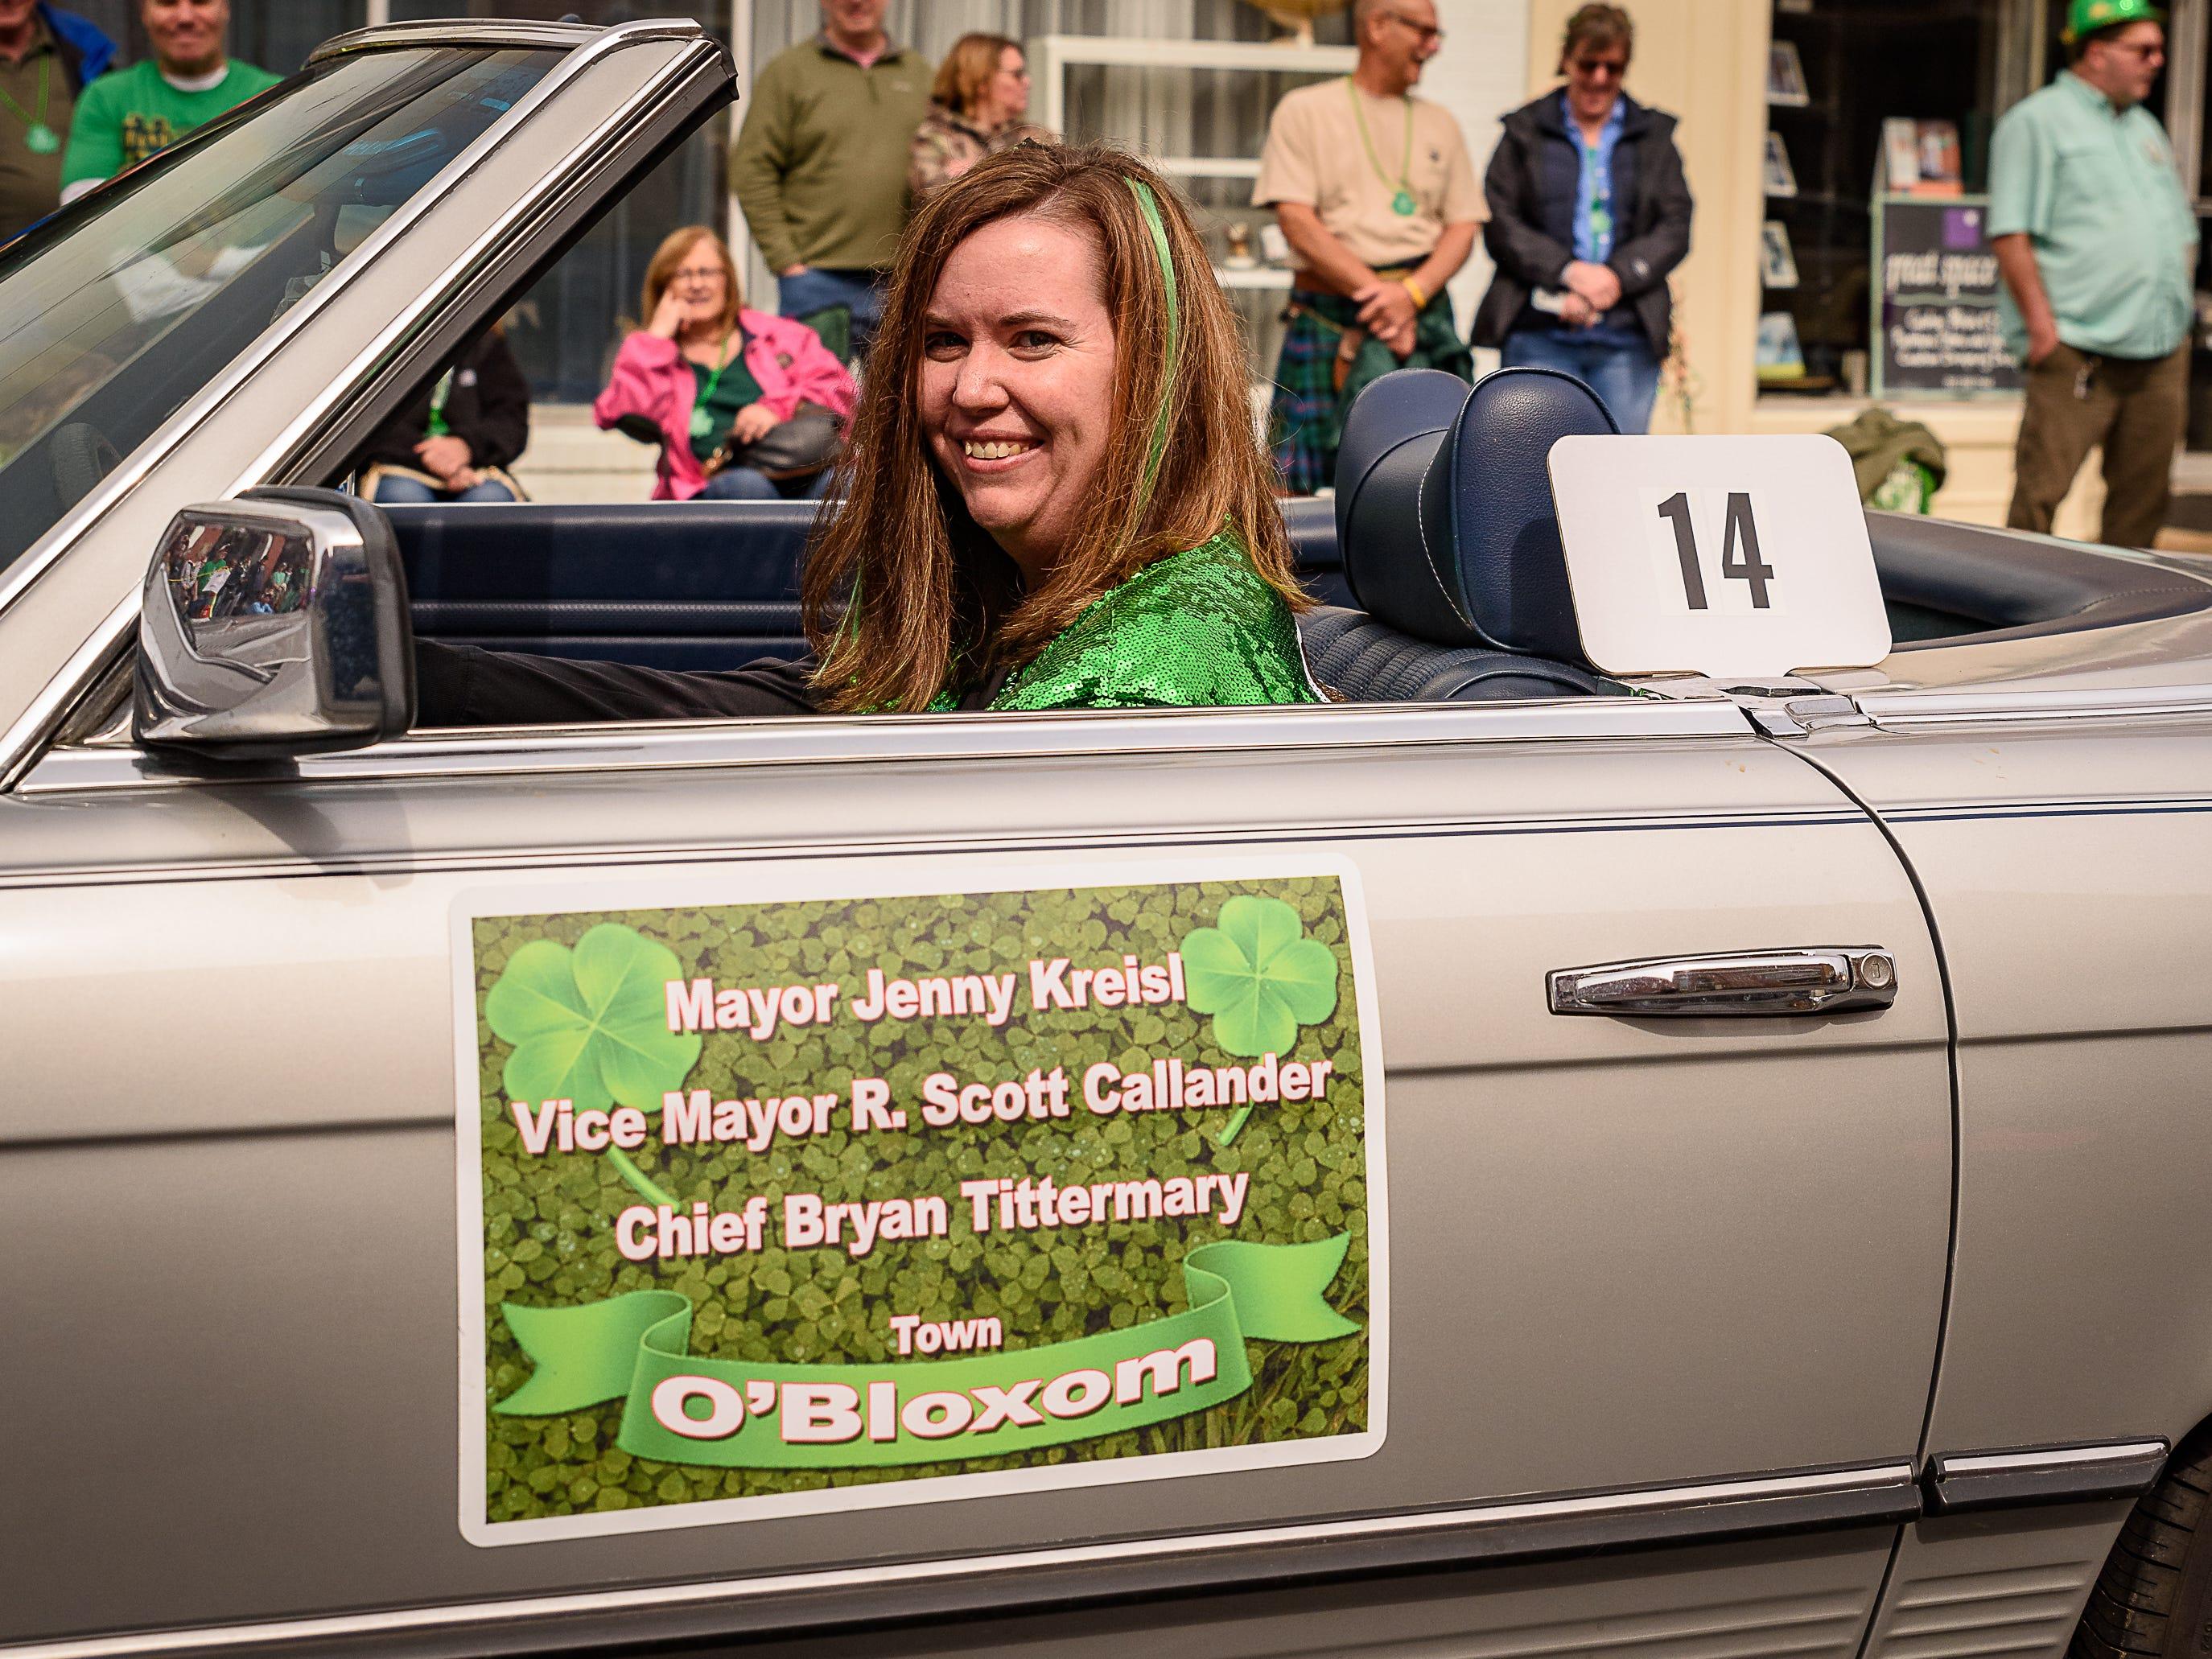 Bloxom Mayor Jenny Kreisl drives herself along the parade route in Onancock.